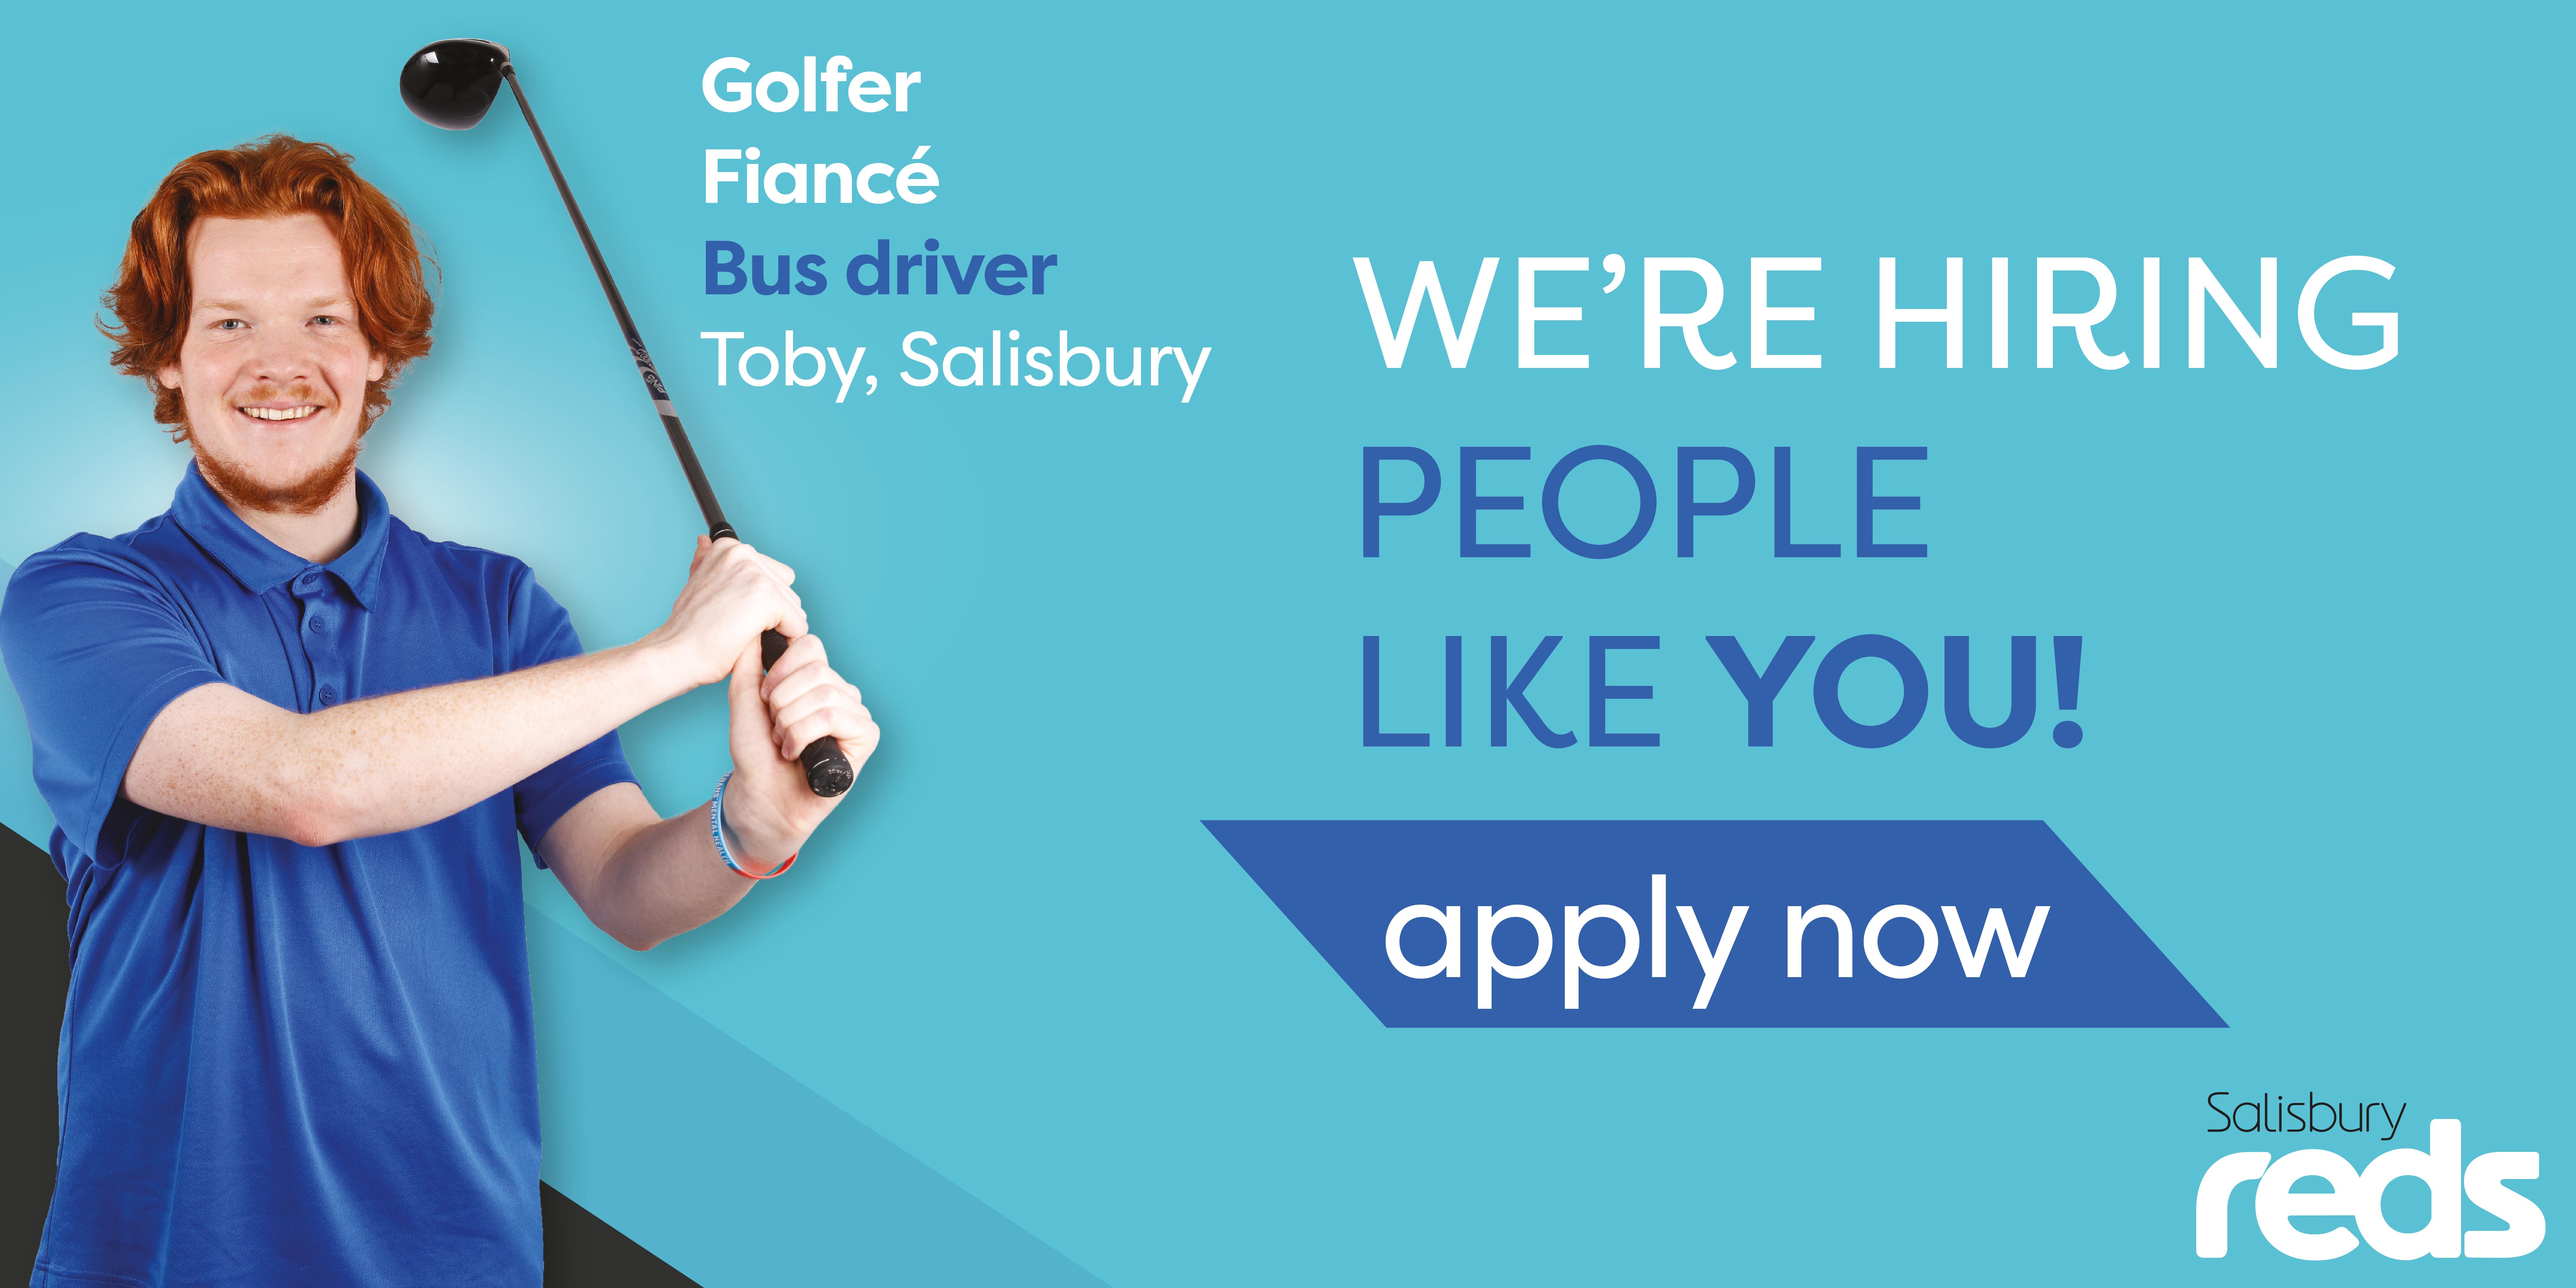 We're hiring people like you